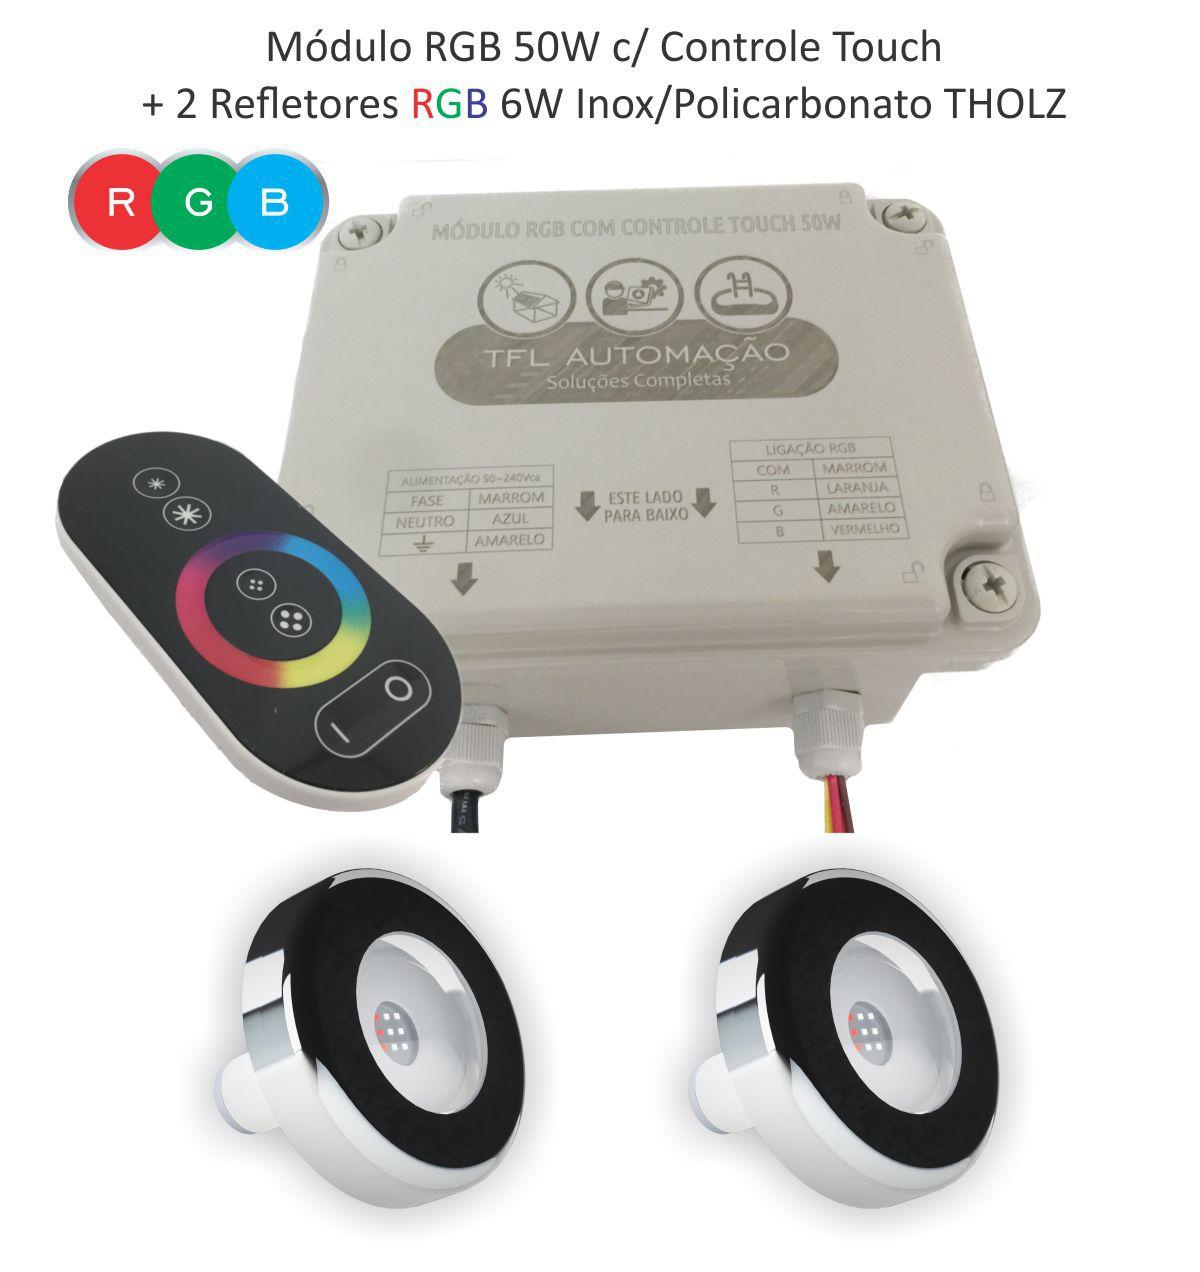 Kit Iluminação Piscina - 2 Leds Rgb 6w Tholz + Módulo c/ Controle Touch 50w